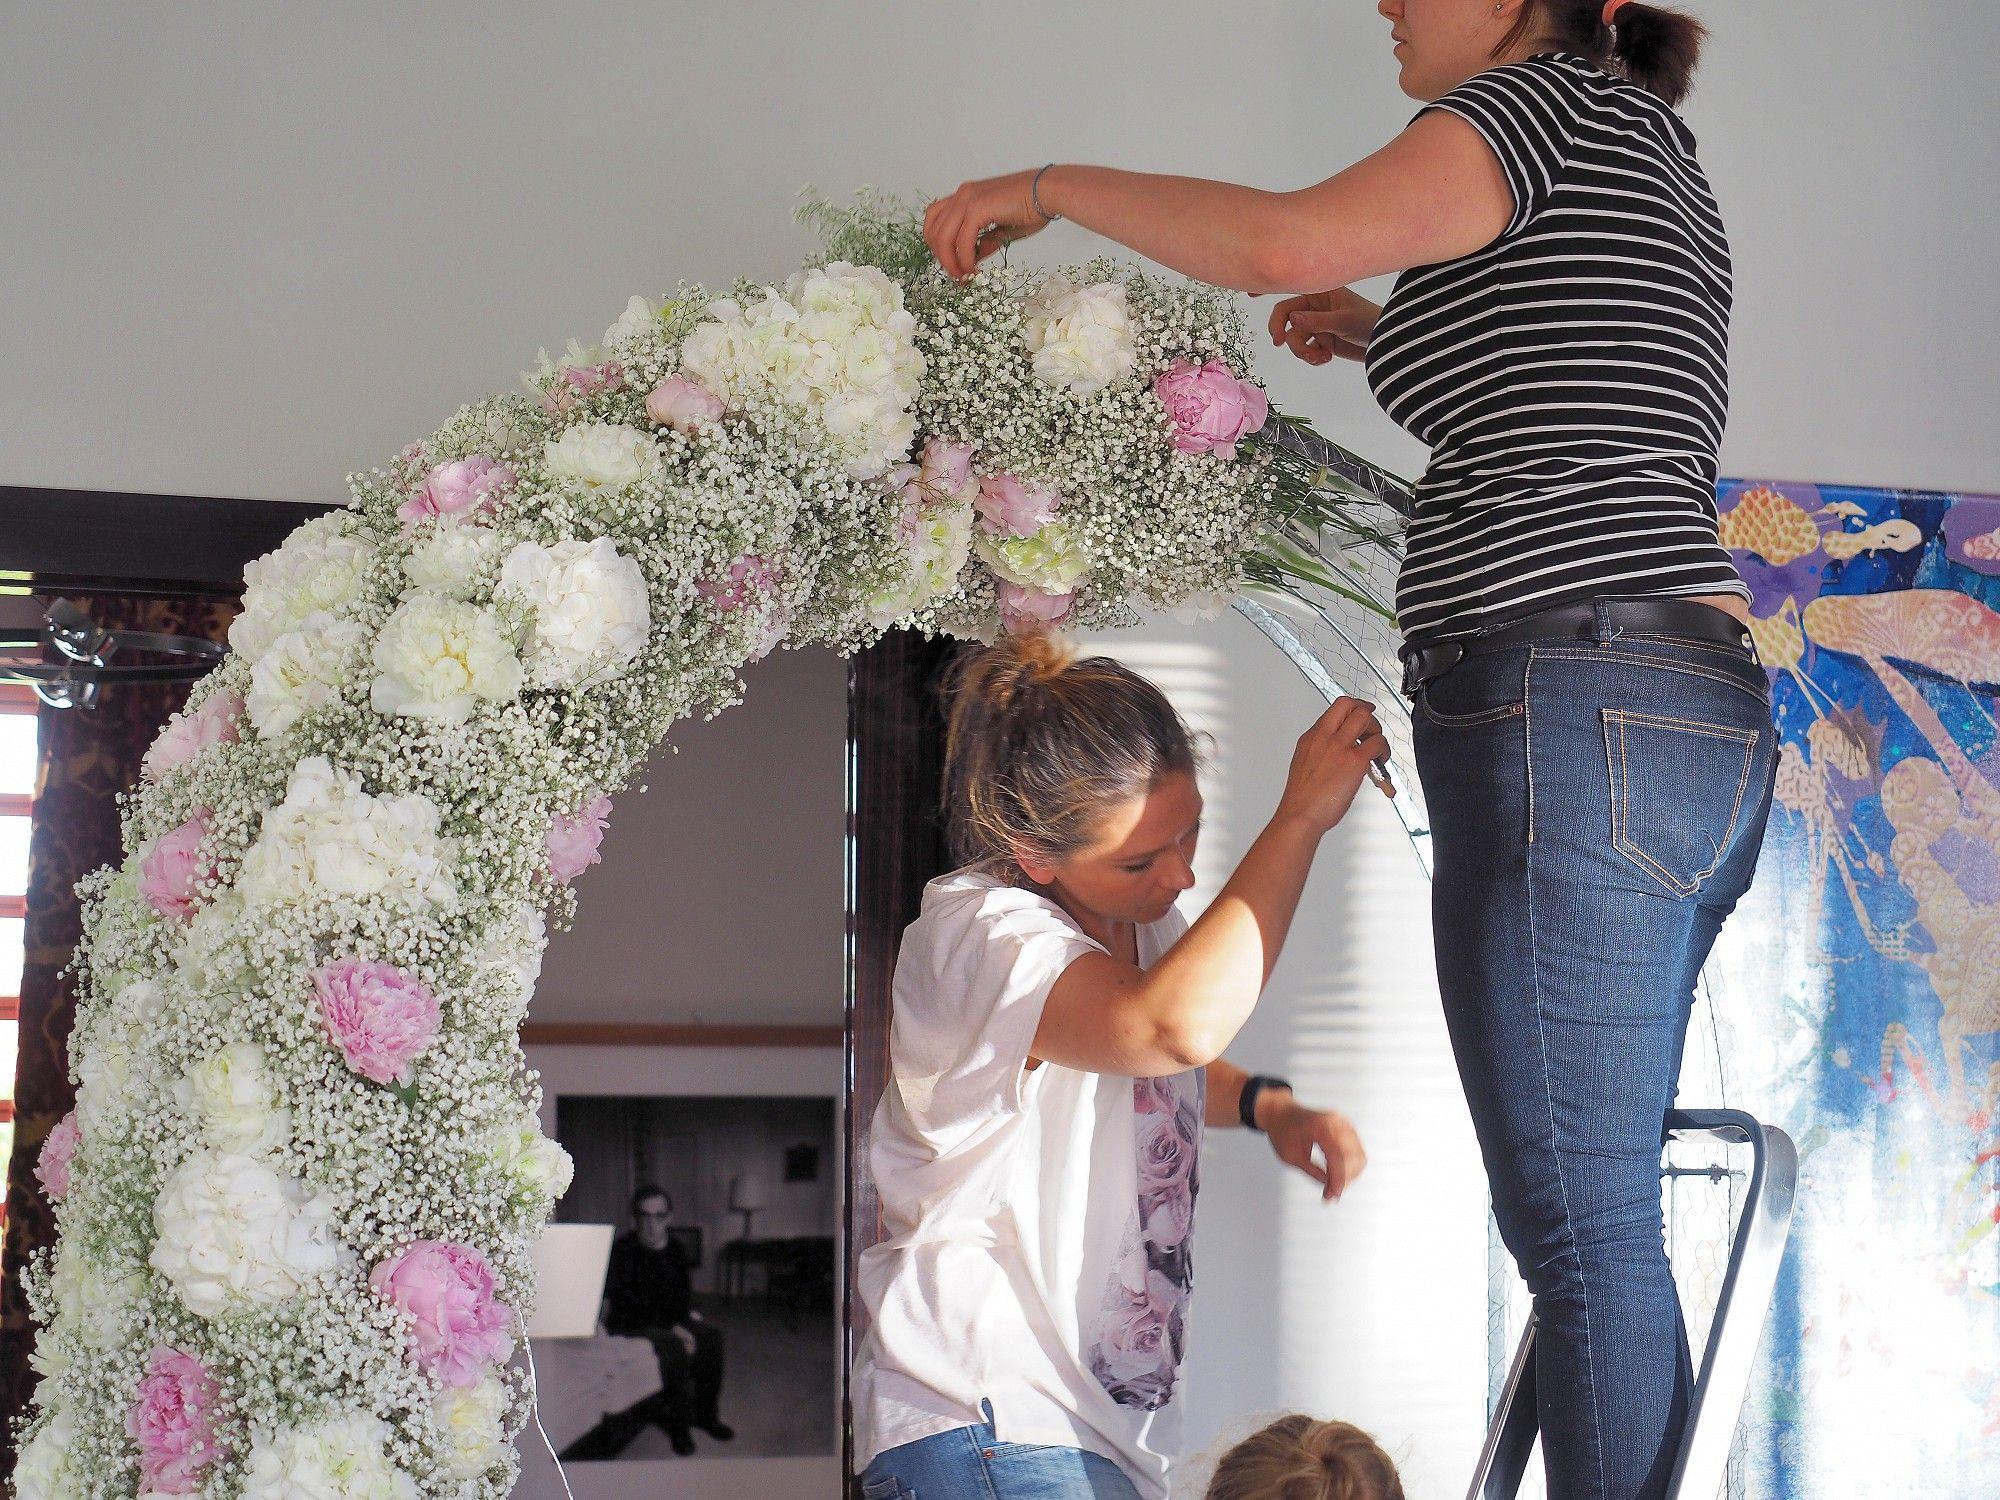 blumen koch berlin blumen online bestellen blumendekoration f r veranstaltungen florist. Black Bedroom Furniture Sets. Home Design Ideas